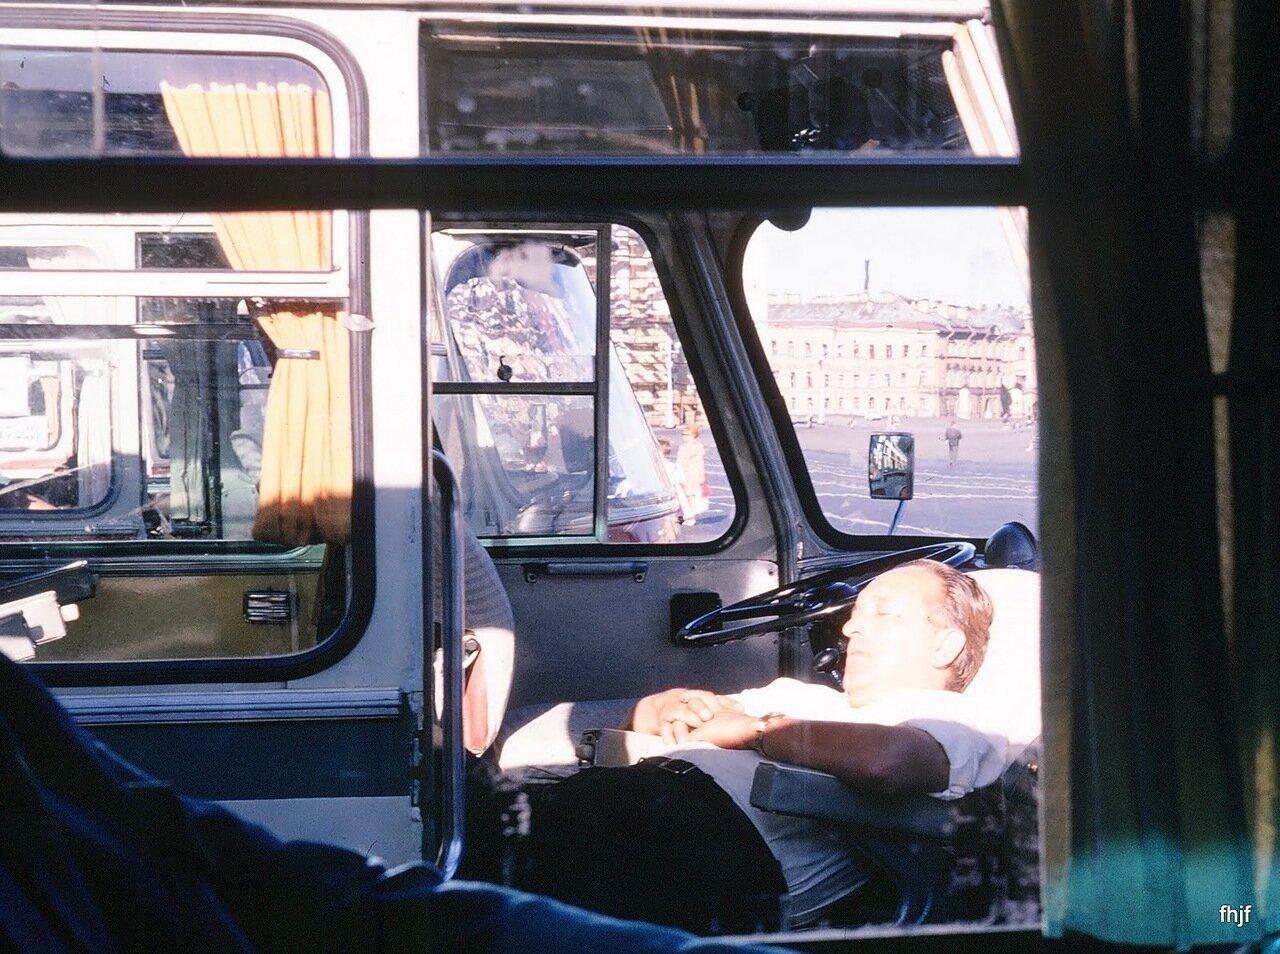 Bus driver asleep